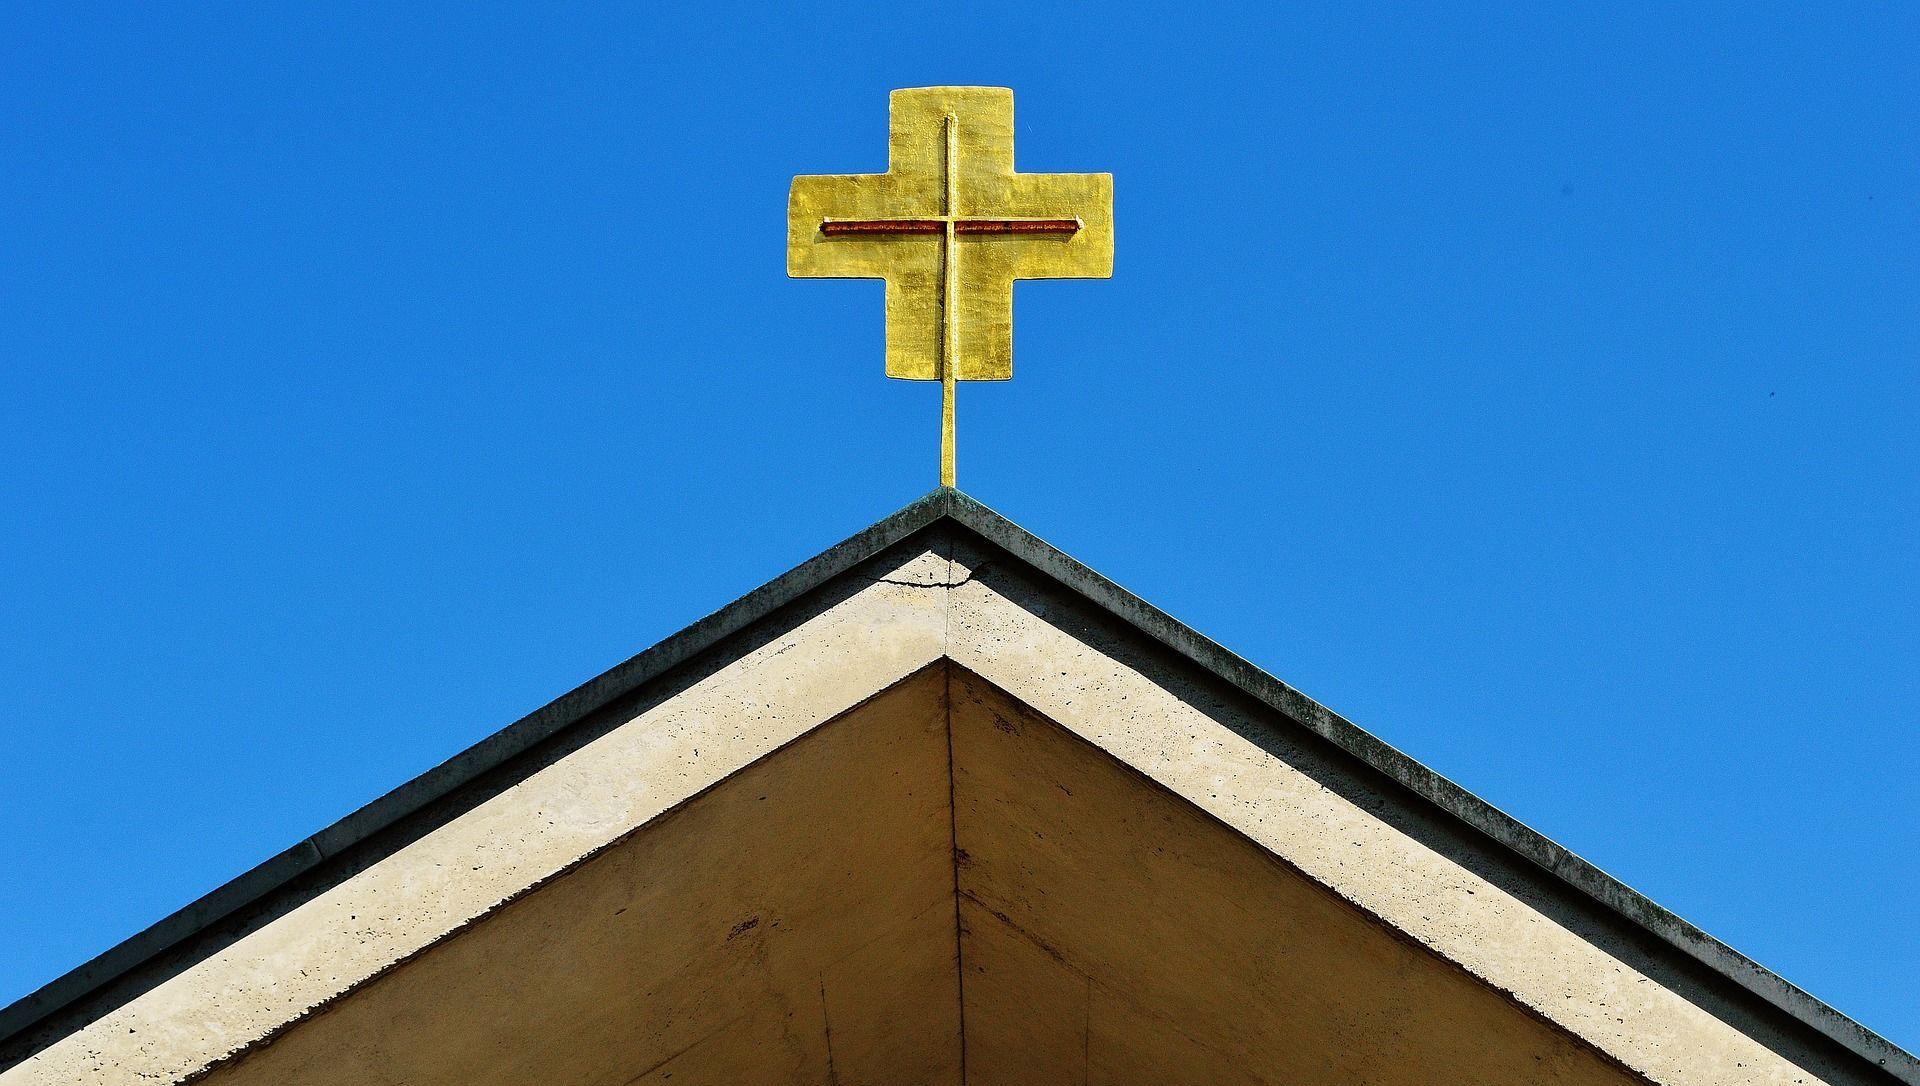 La croce di una chiesa - Sputnik Italia, 1920, 03.04.2021